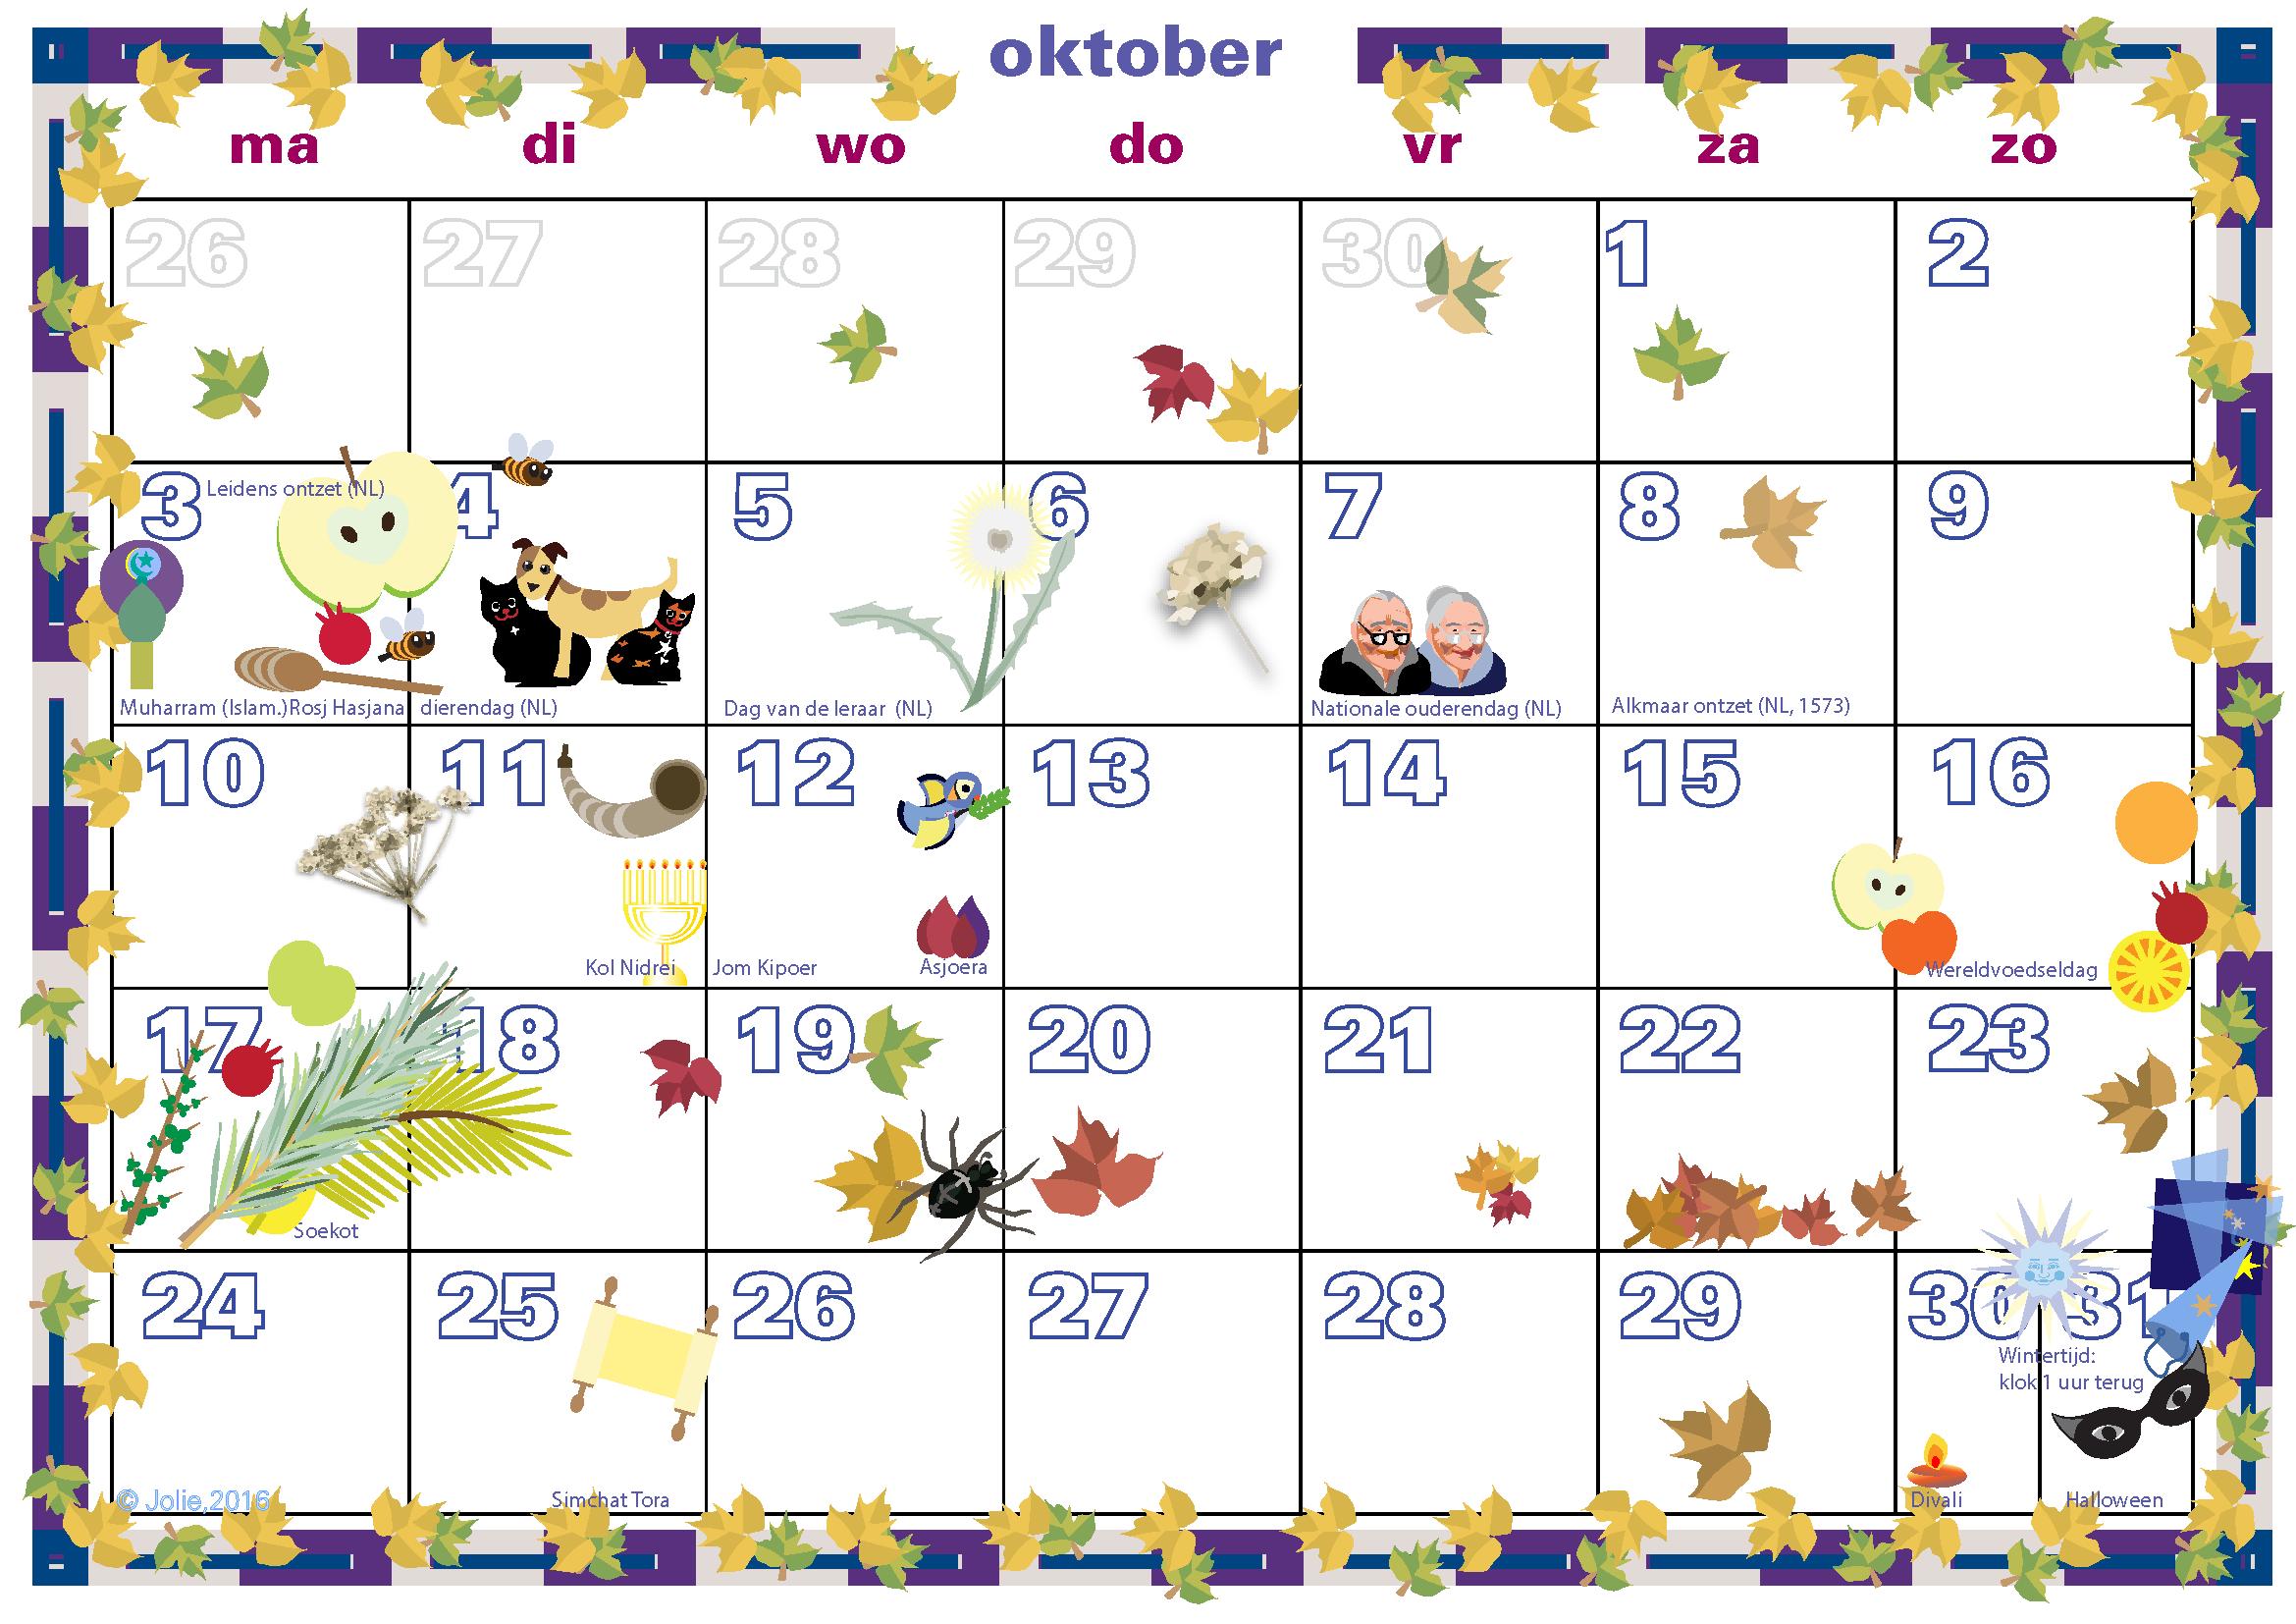 November Kalender 2015 | Calendar Template 2016